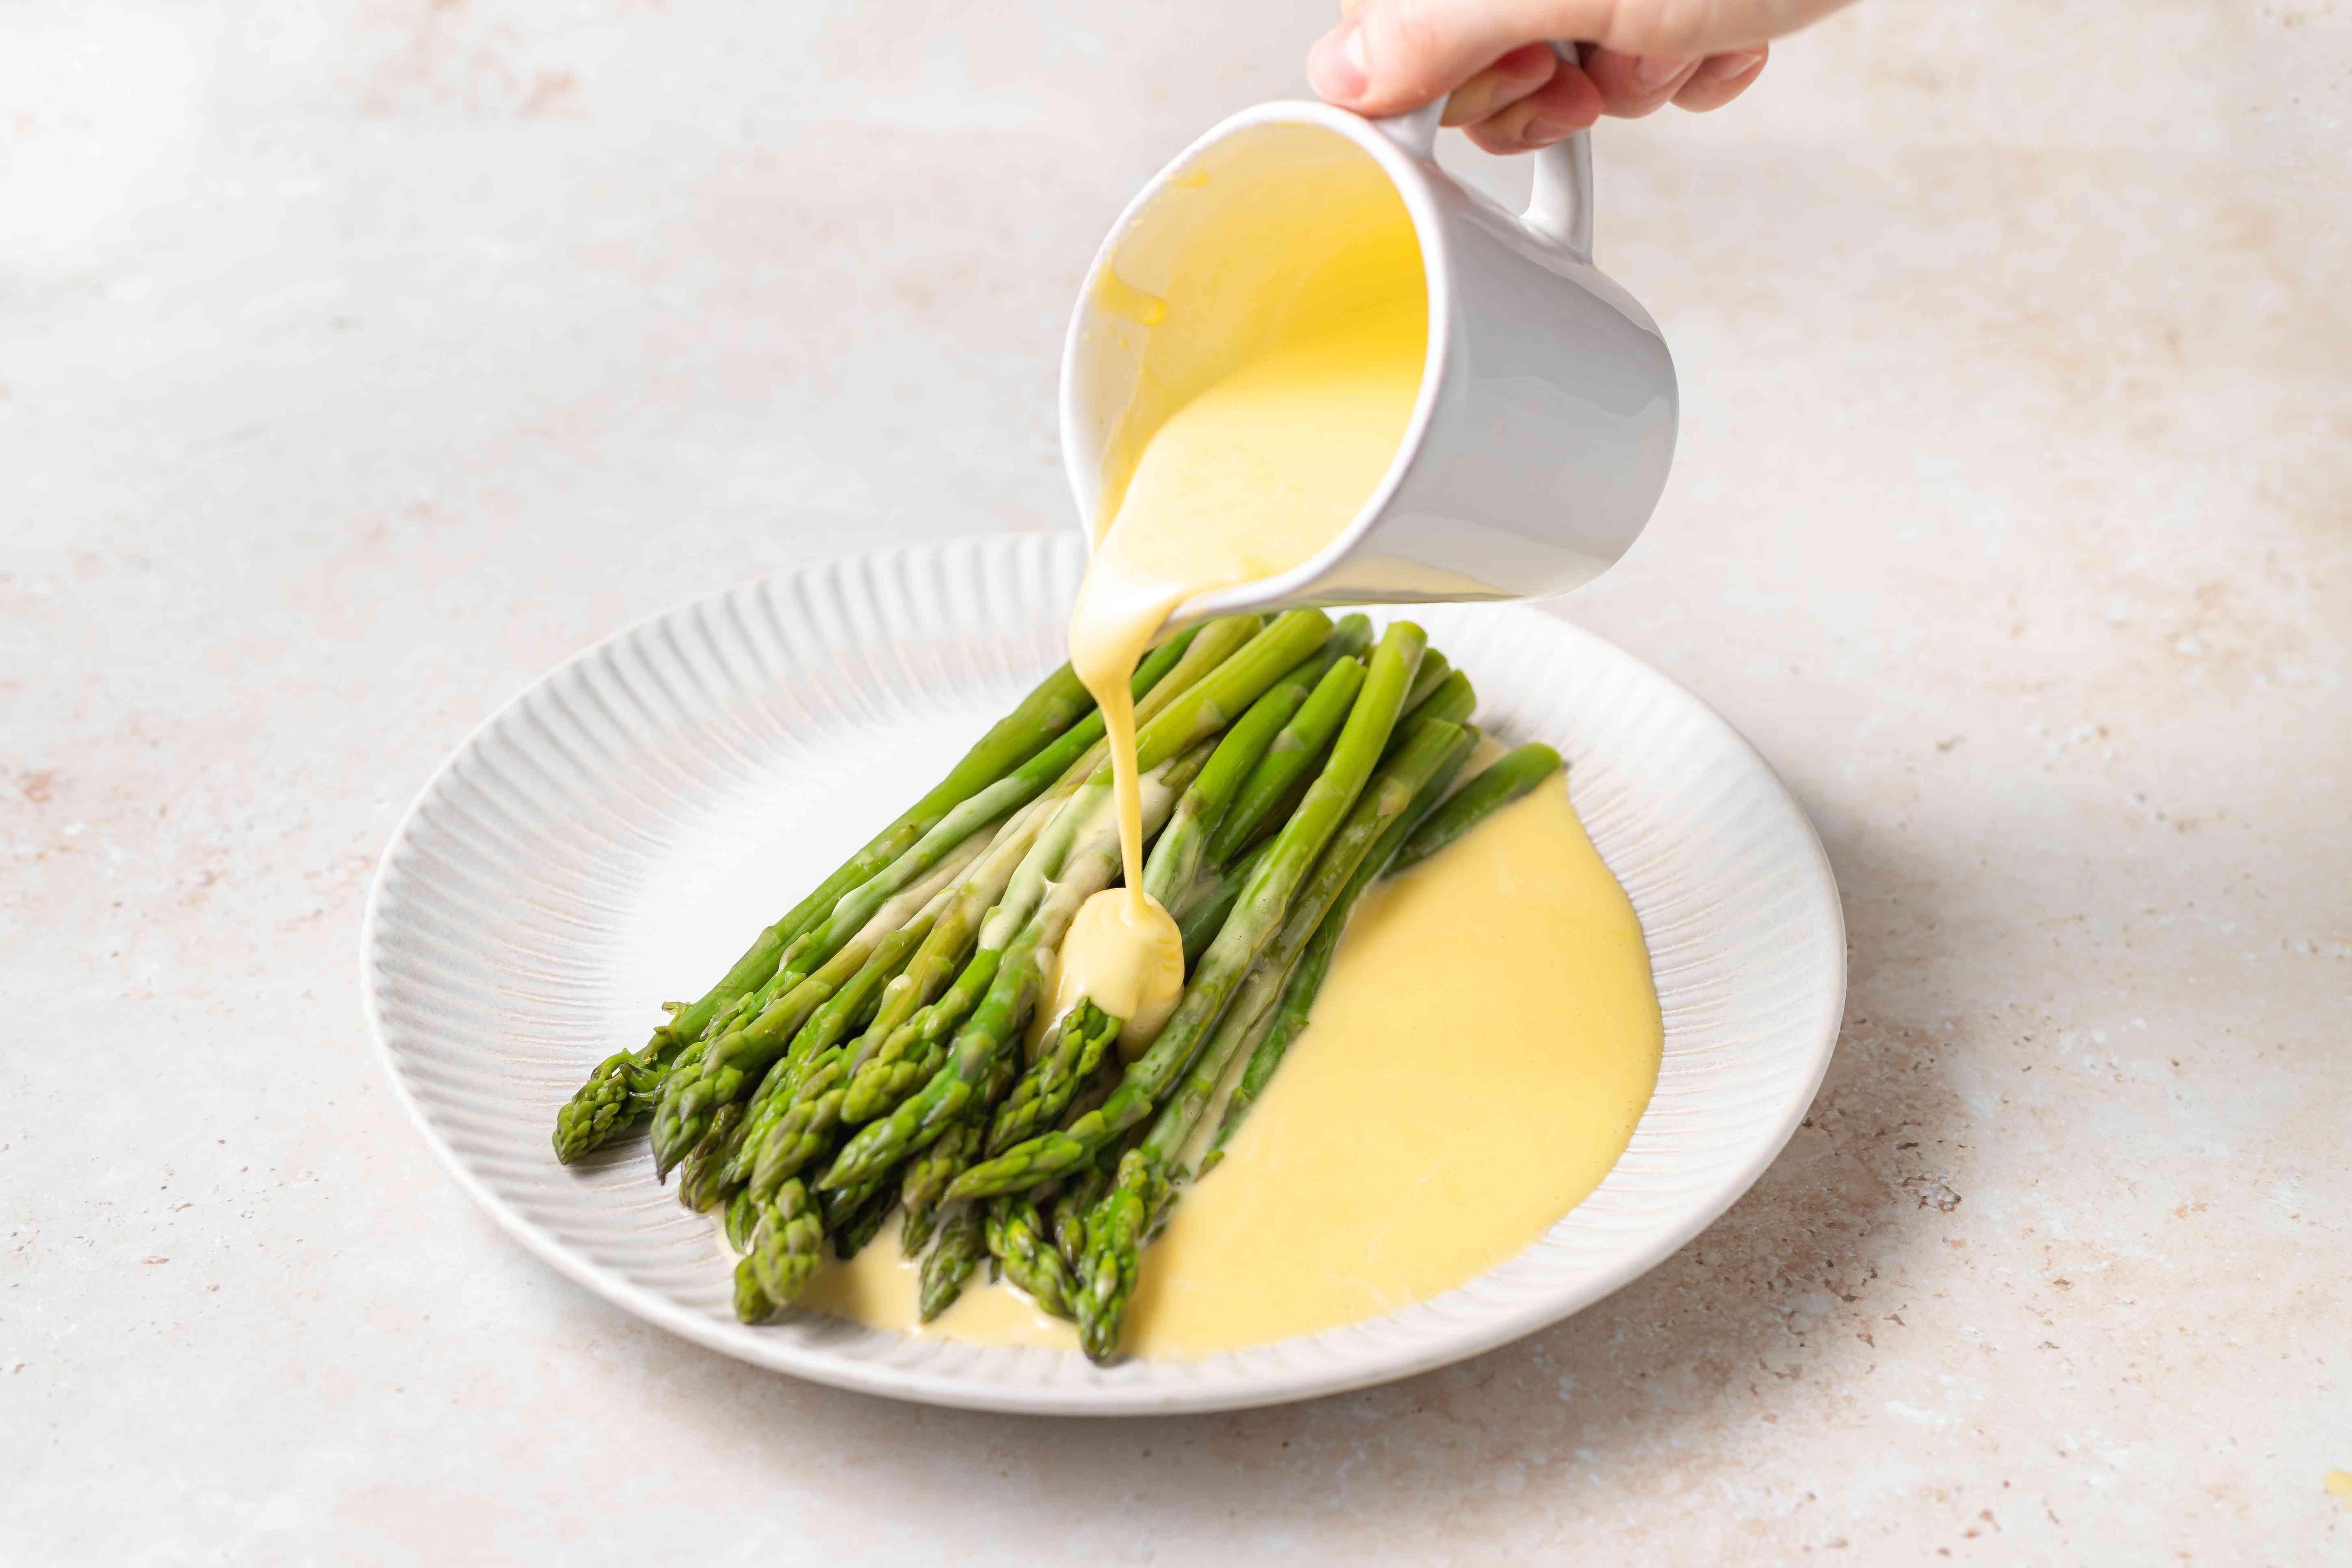 Blender Hollandaise Sauce poured over asparagus.